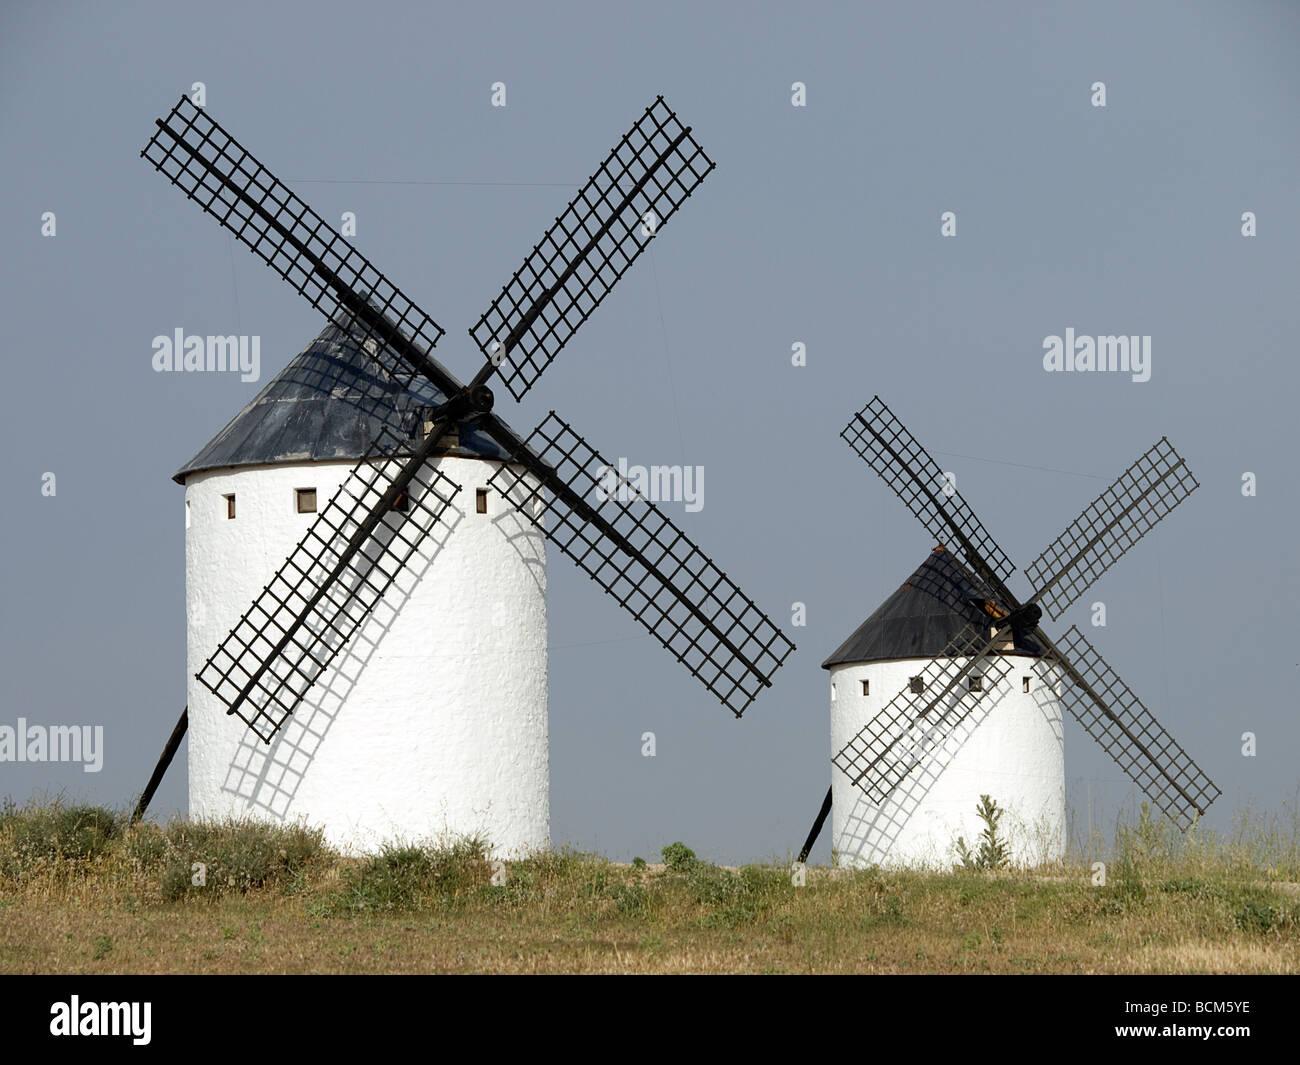 Windmills on La Mancha, Spain - Stock Image